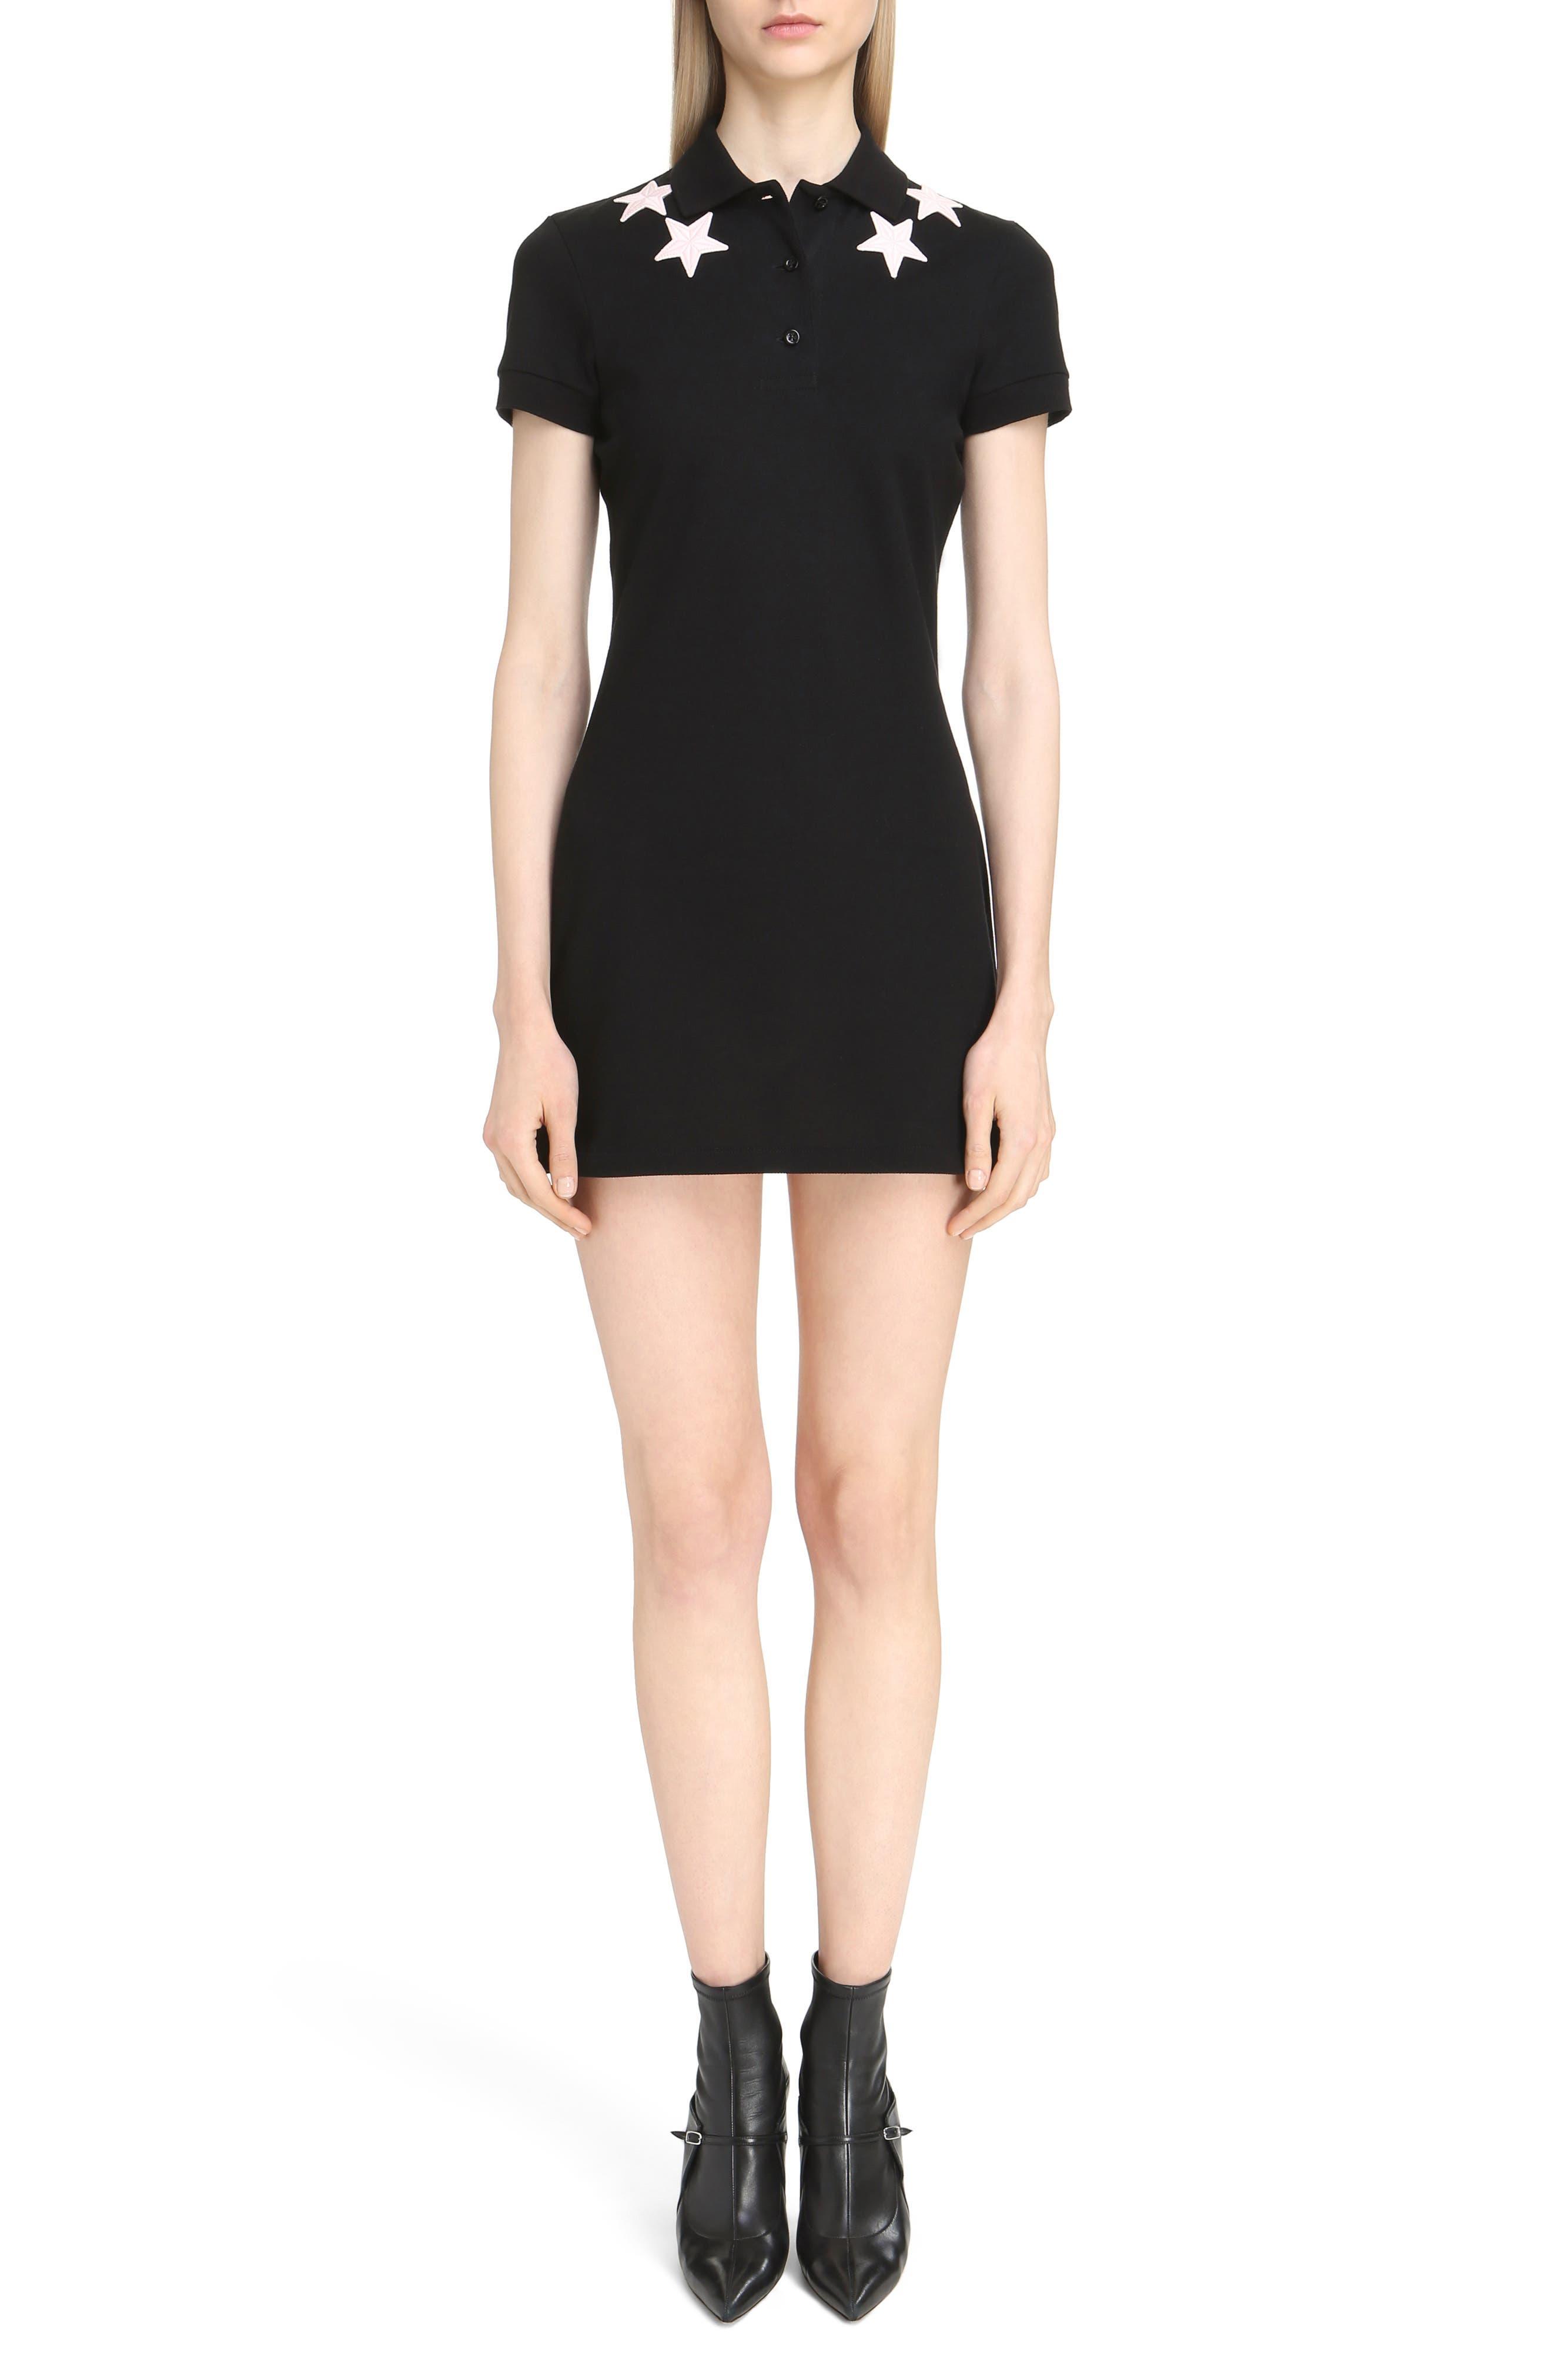 Givenchy Star Embellished Polo Dress